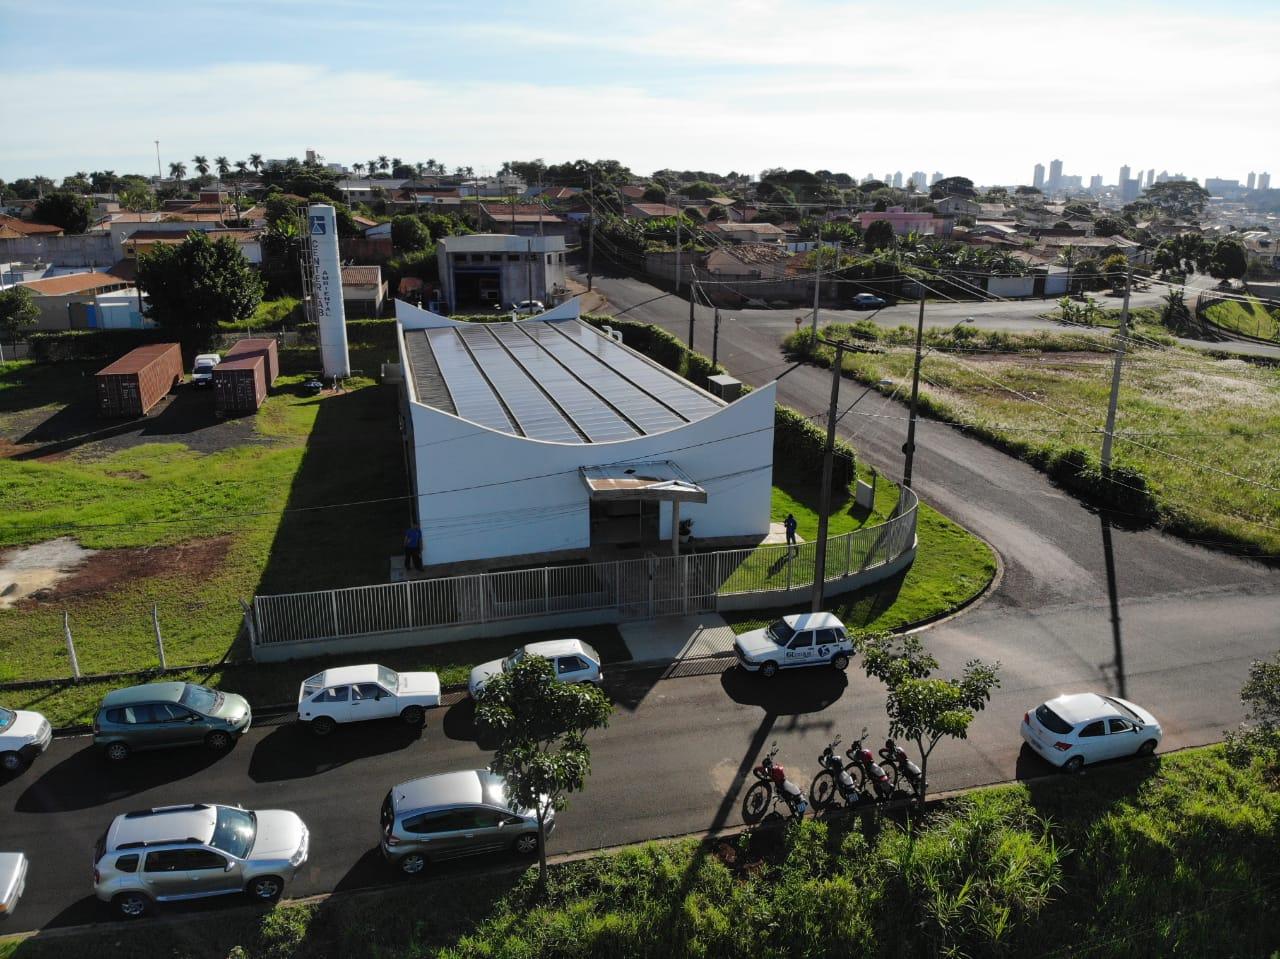 centerlab-energia-solar-fotovoltaica-araraquara-sao-carlos-matao3